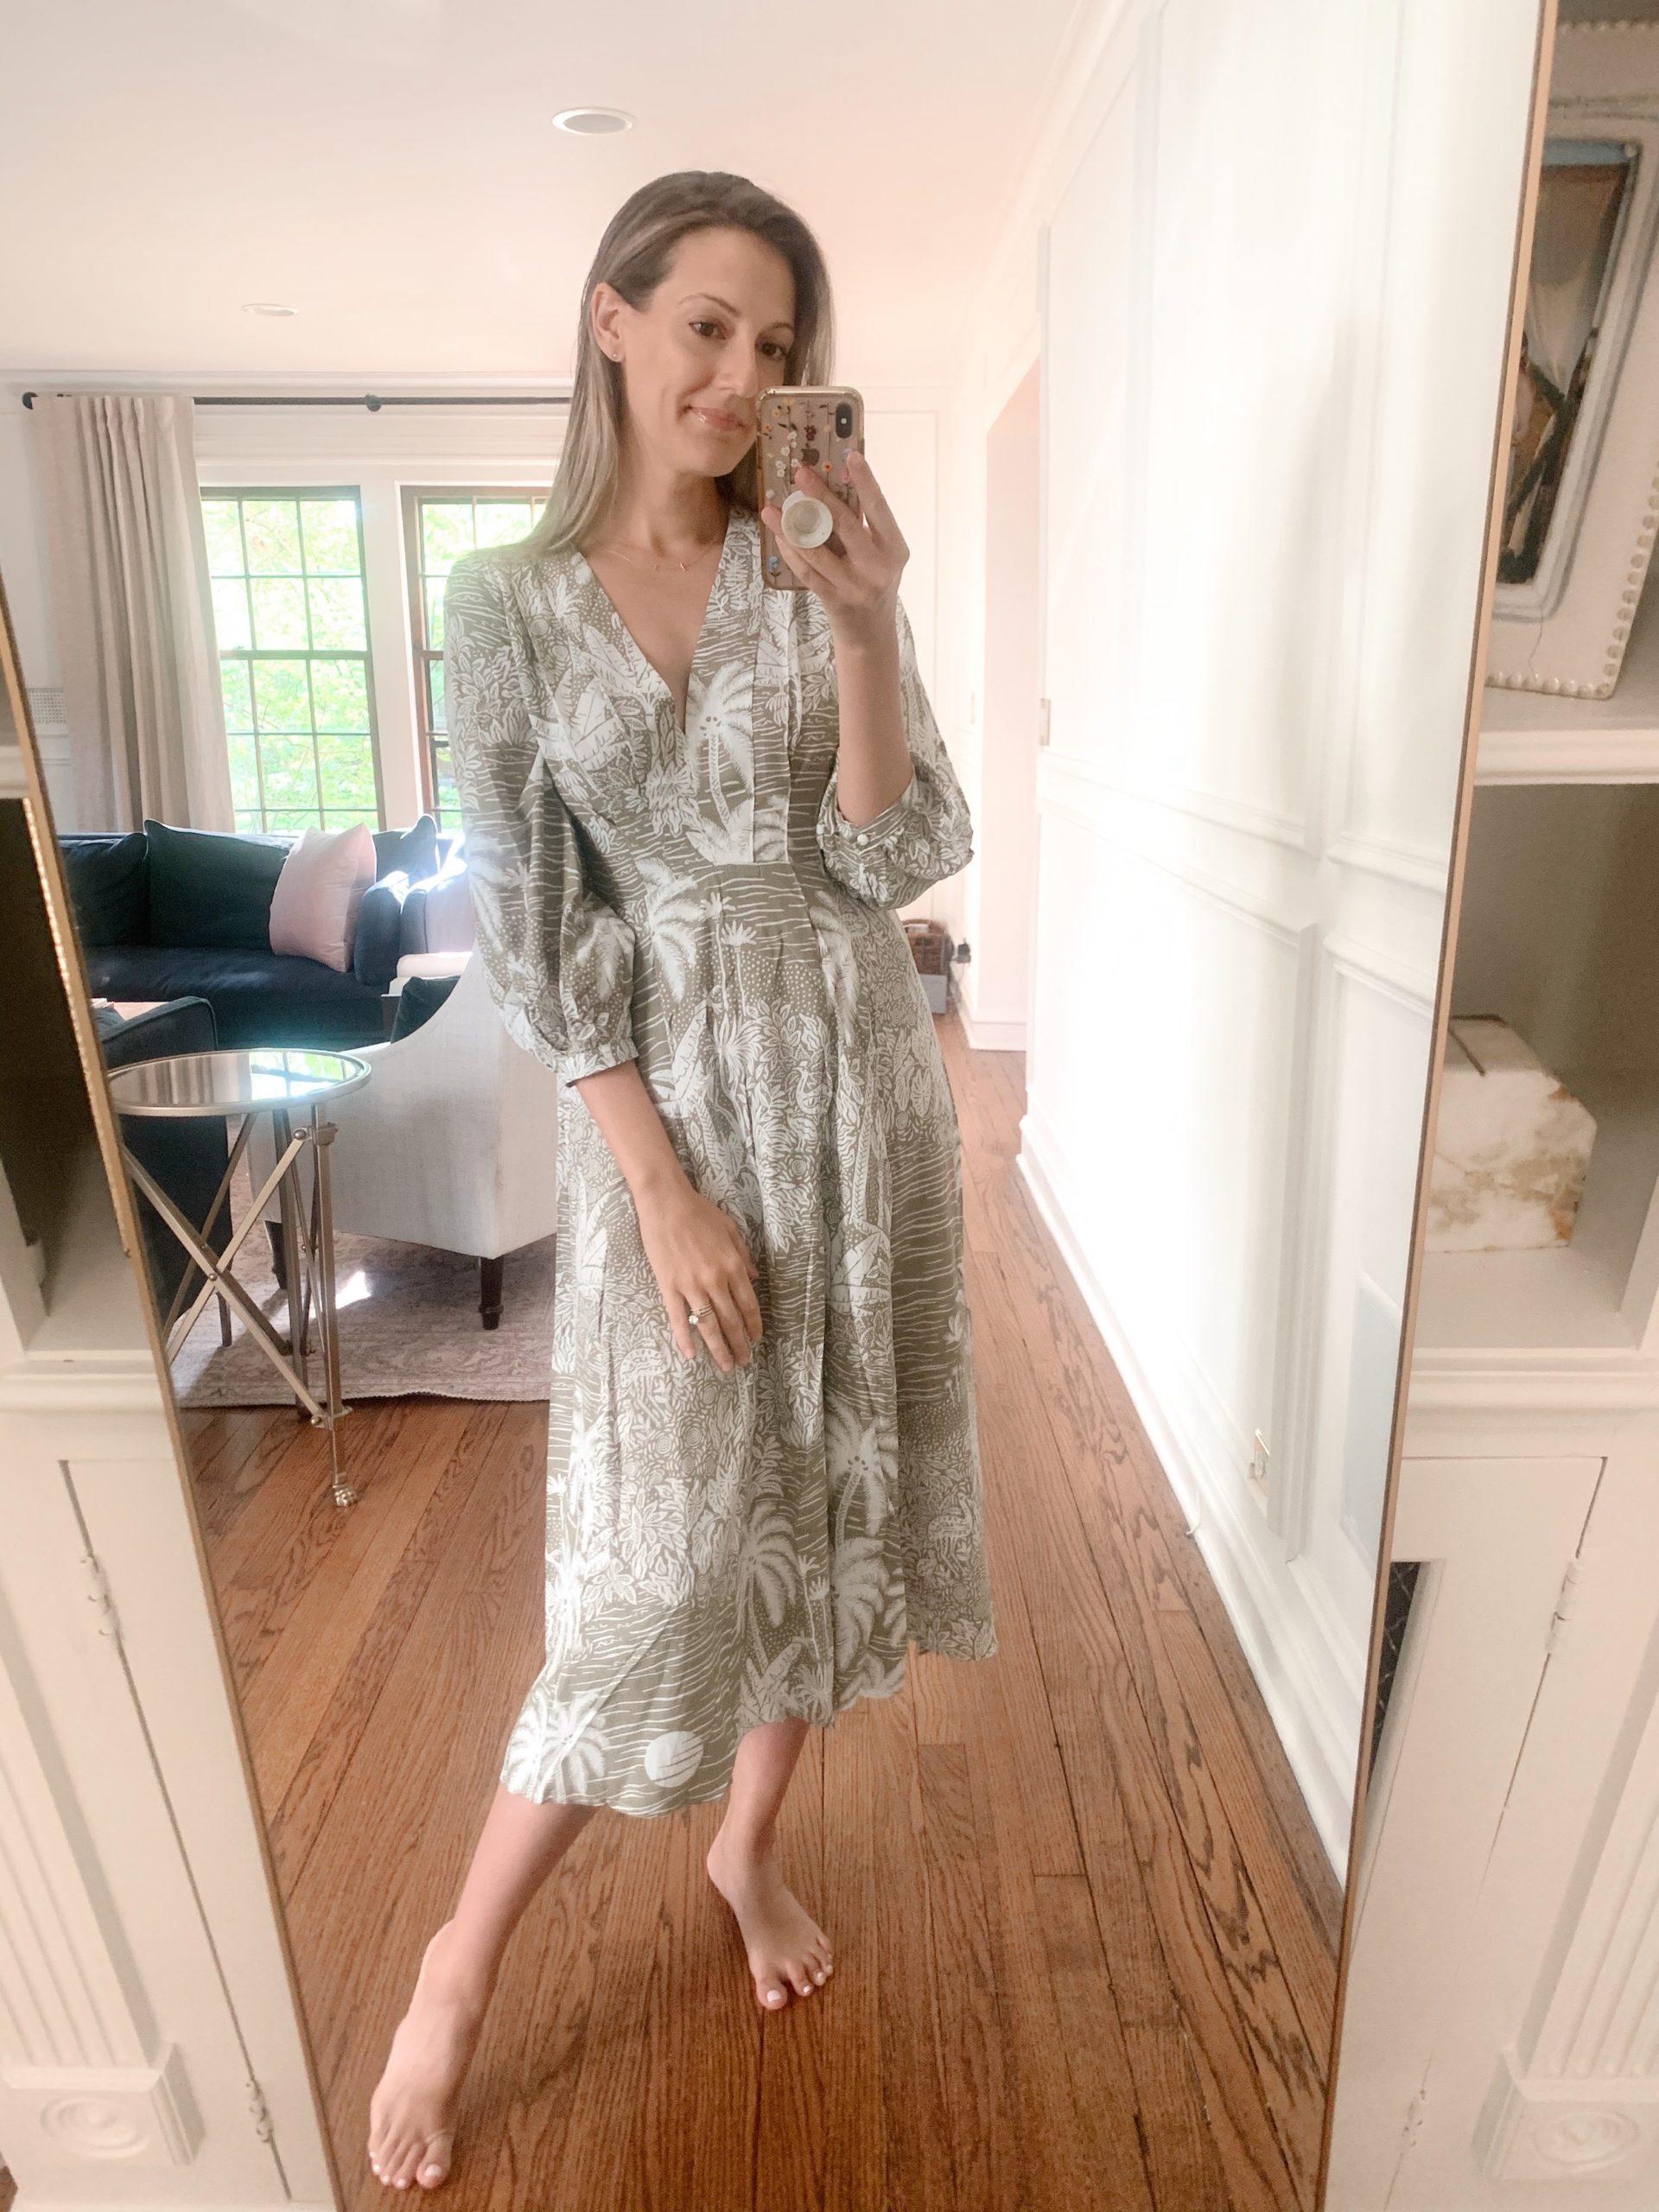 Desmond & Dempsey x H&M long-sleeve midi dress